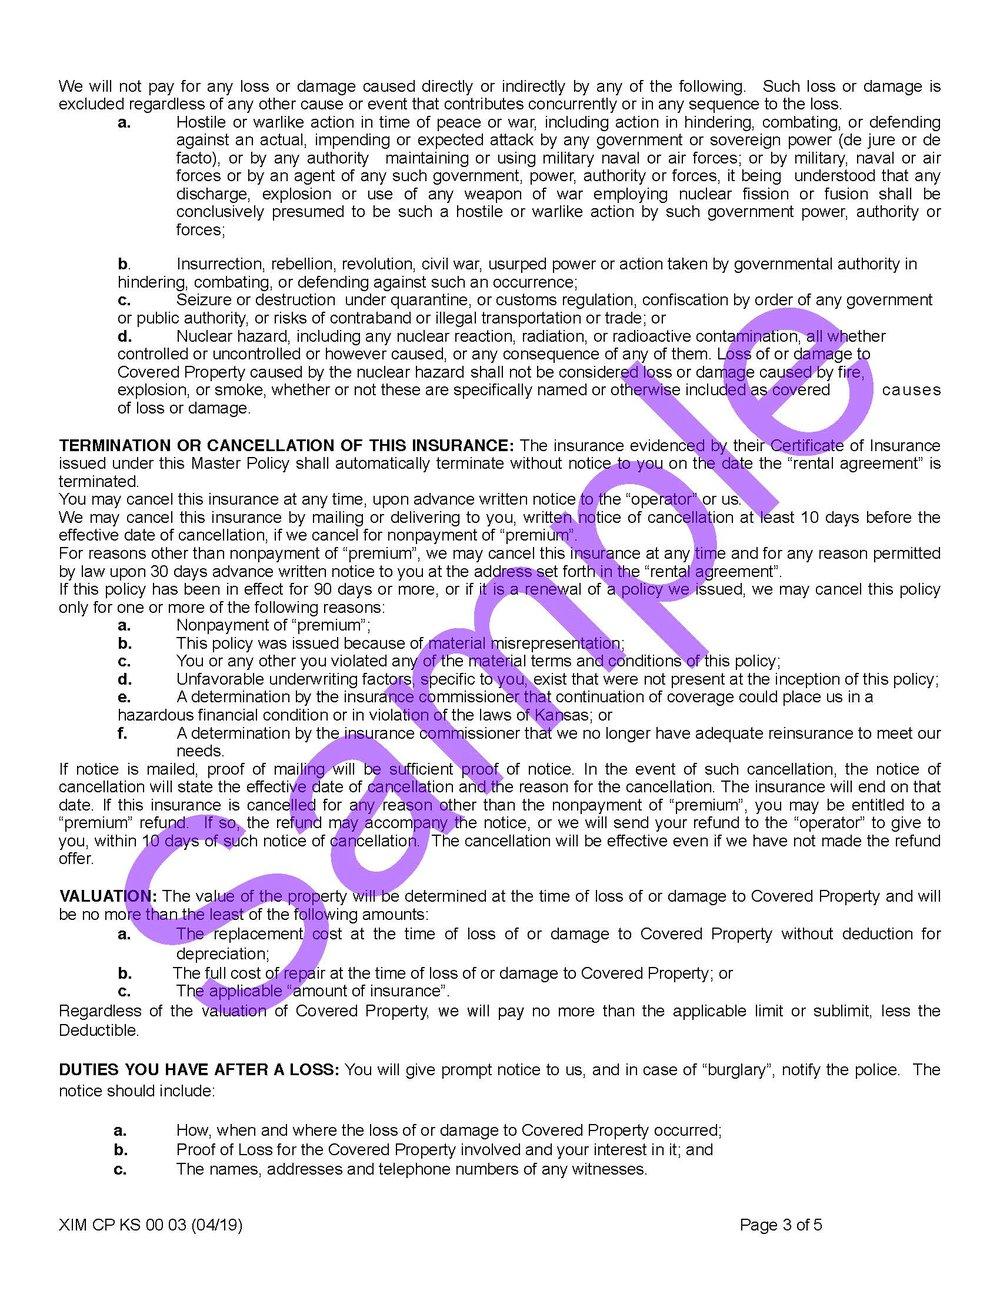 XIM CP KS 00 03 04 19 Kansas Certificate of InsuranceSample_Page_3.jpg